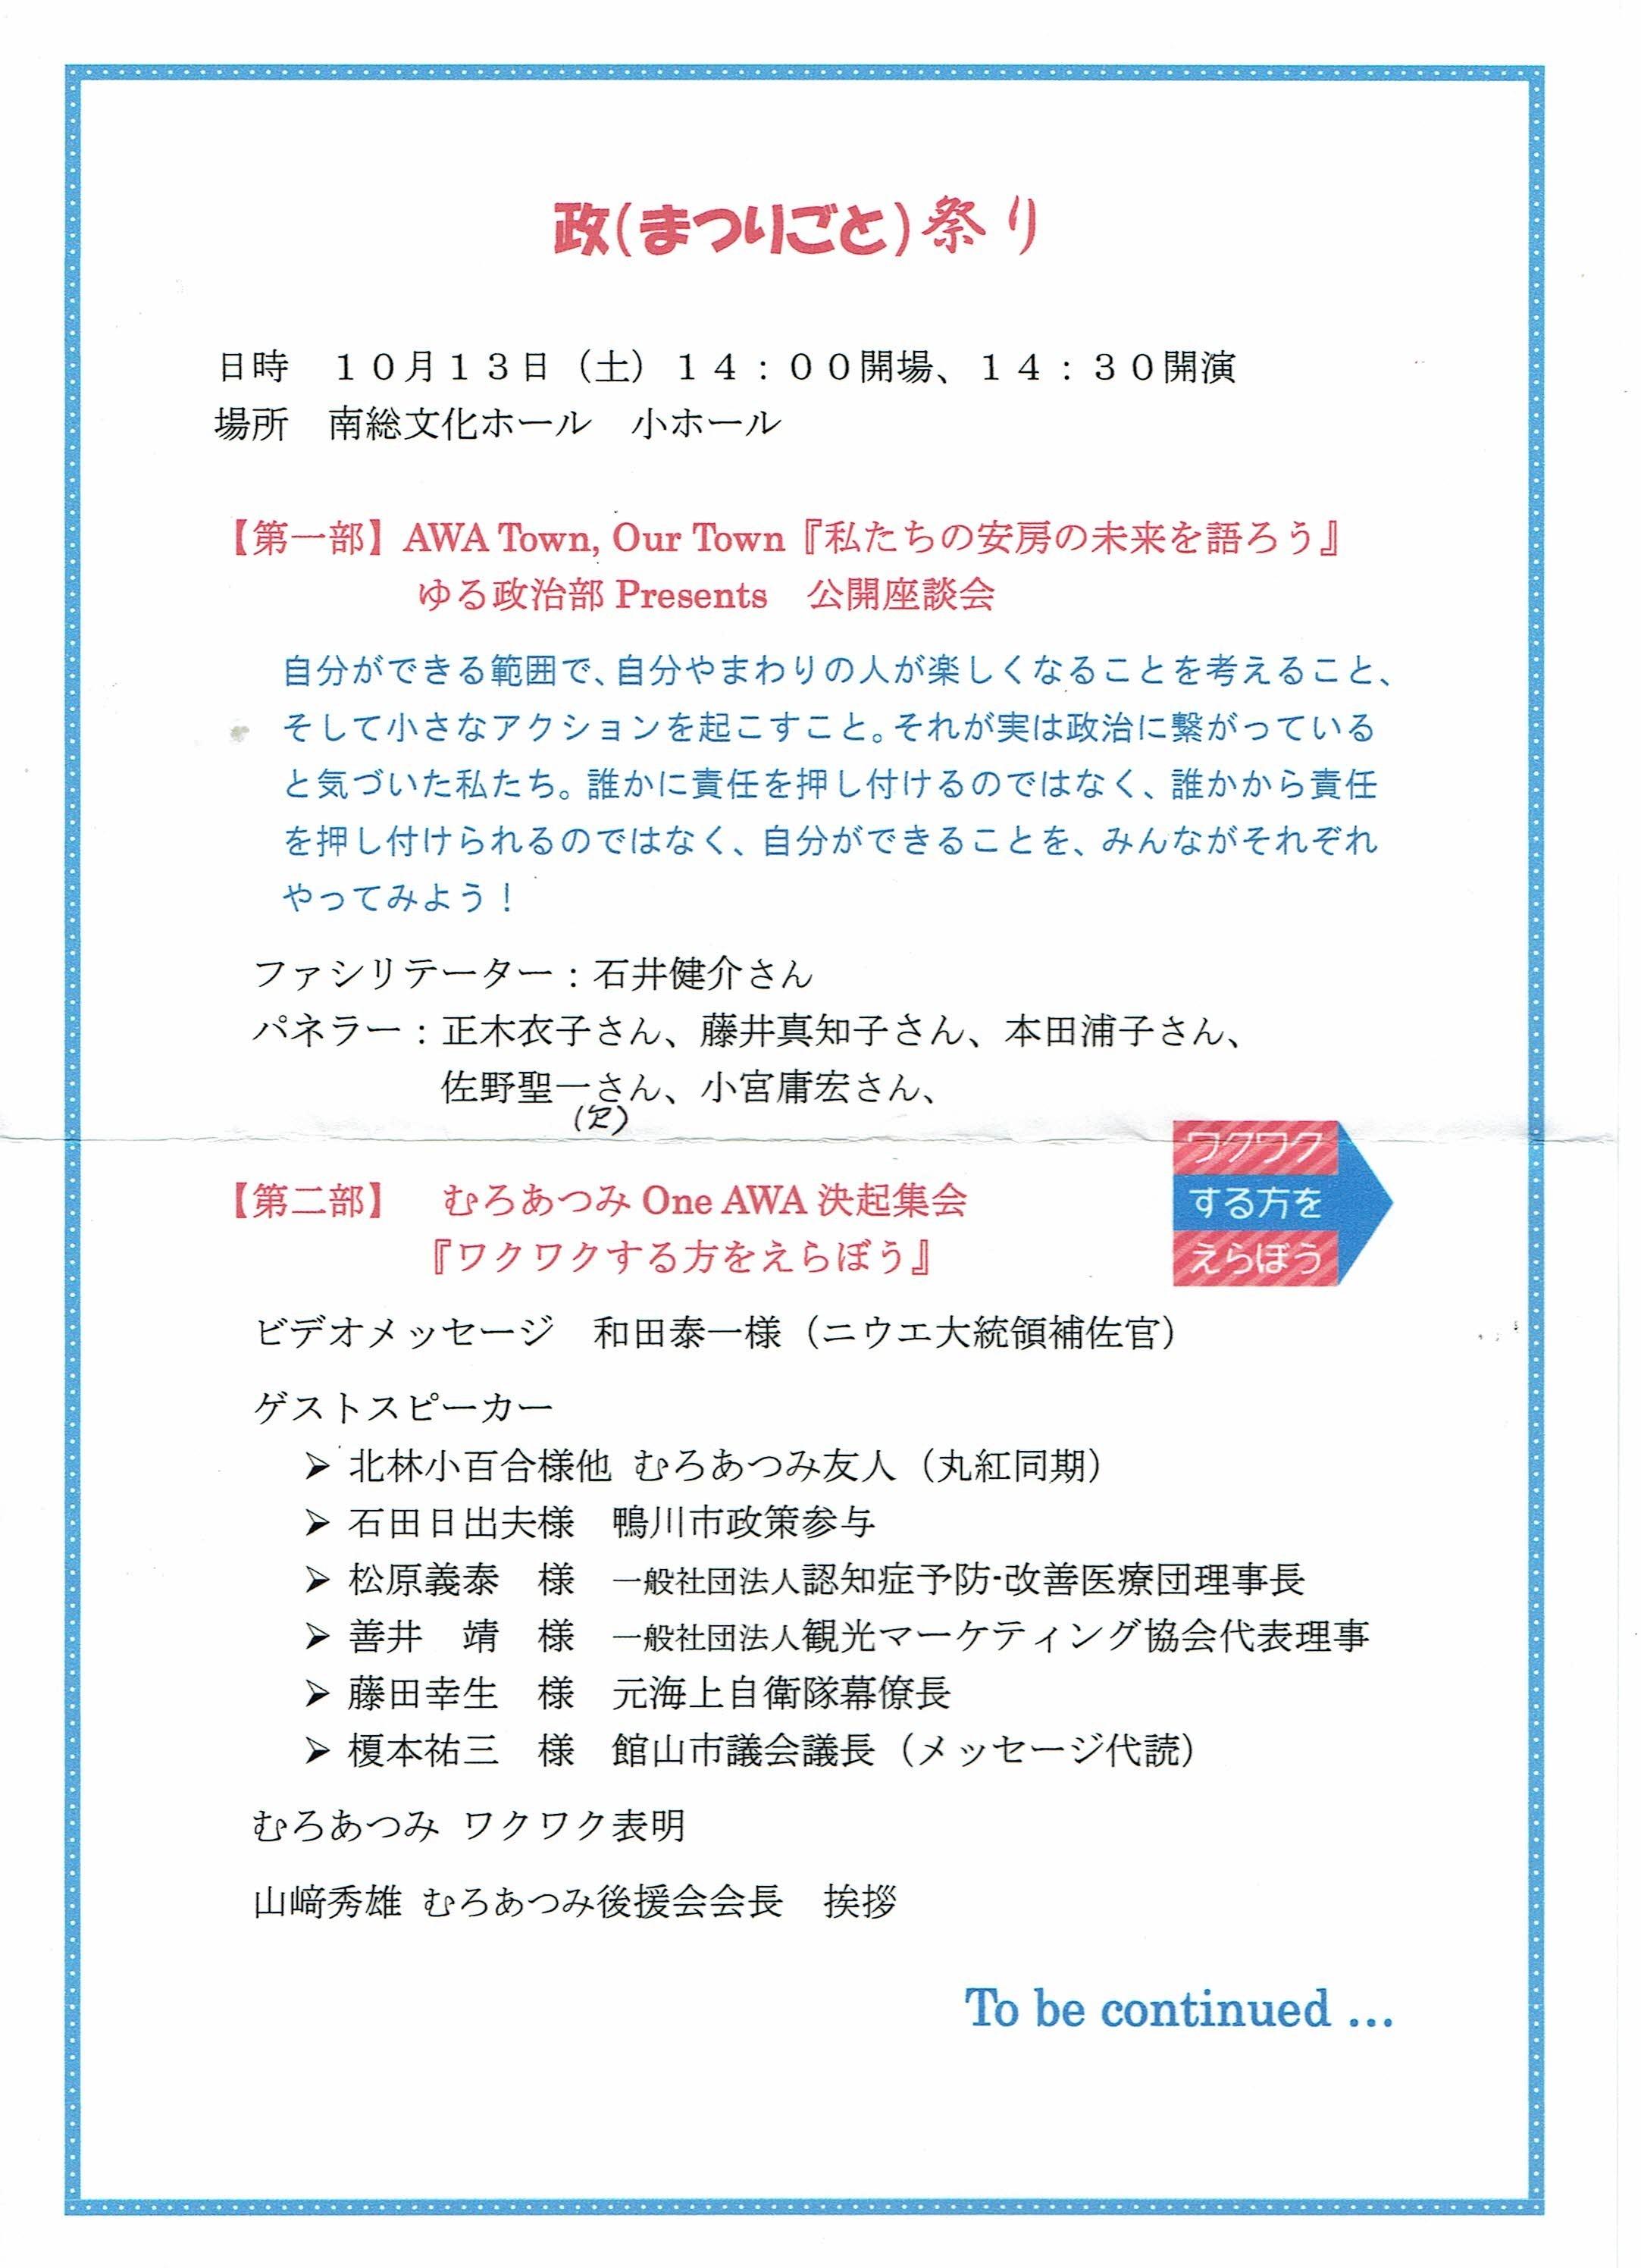 H301013 政祭りプログラム